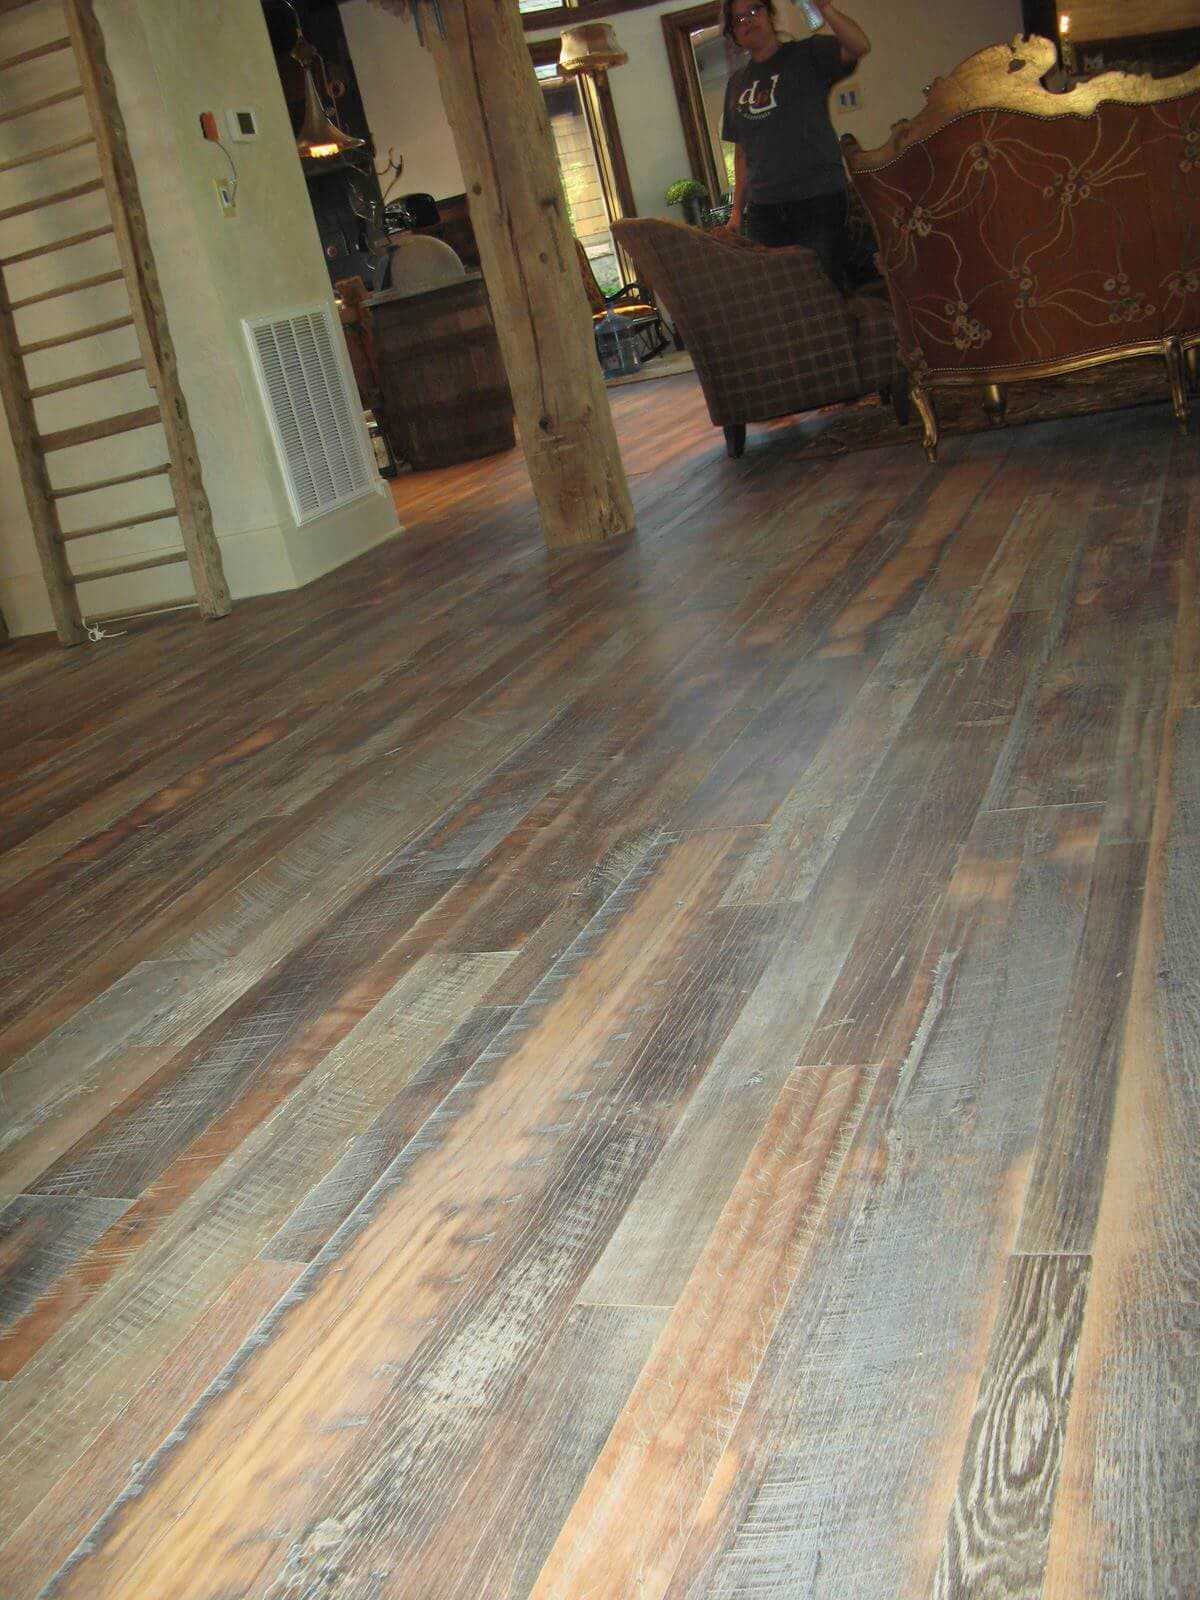 Character reclaimed hardwood floor Hickory NC castle grey WOCA oil